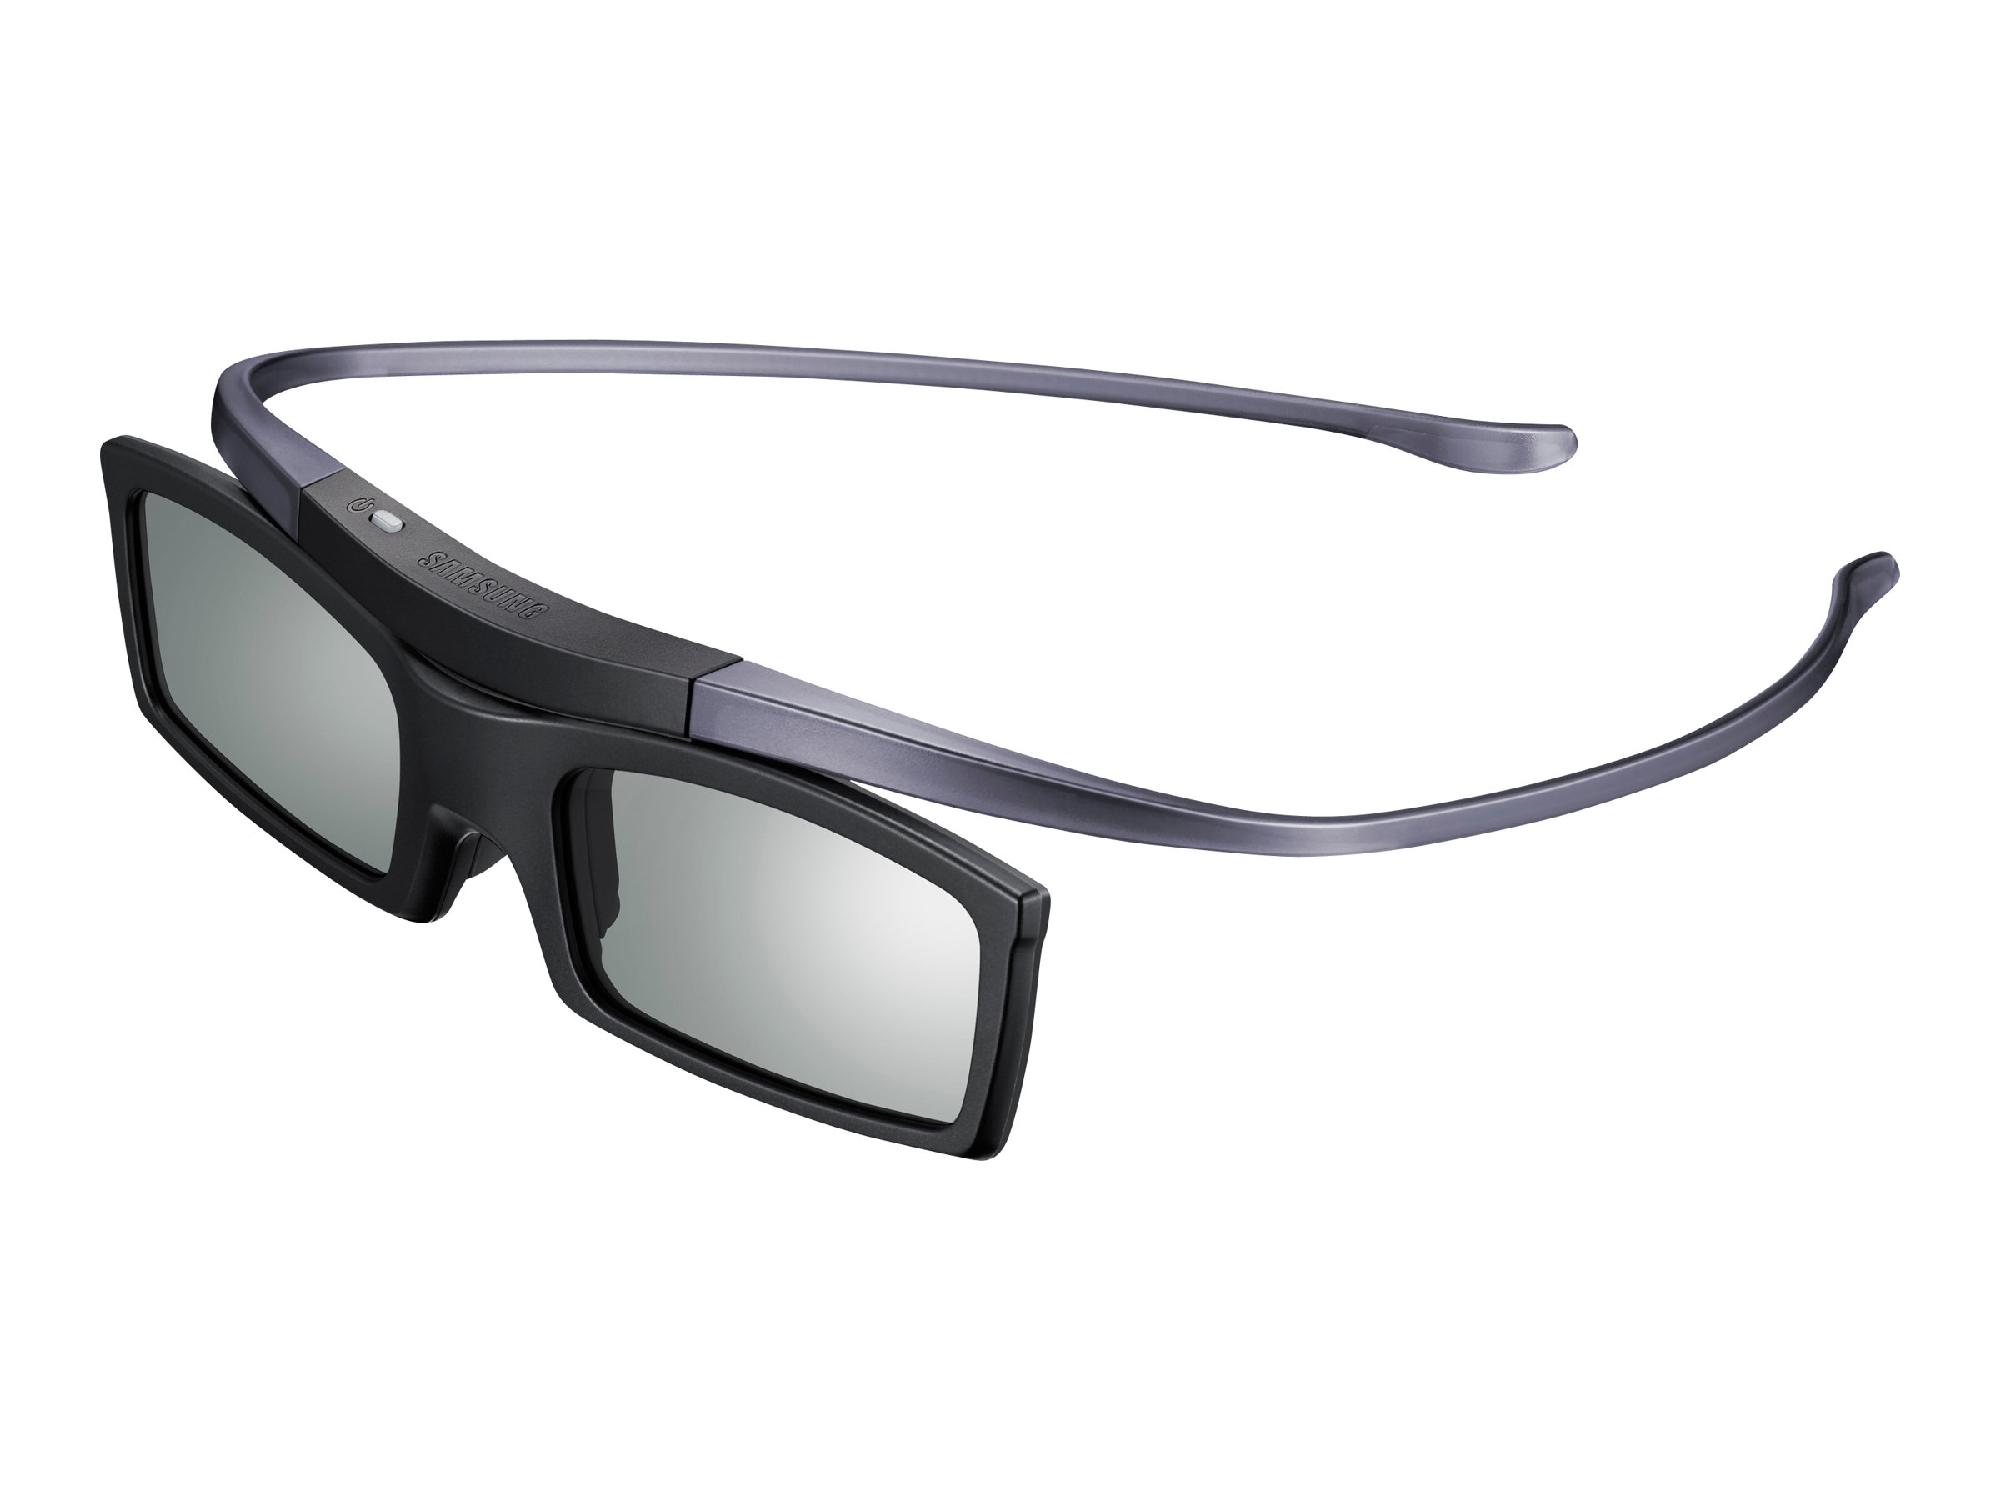 Samsung 3D Active Glasses SSG-5100GB